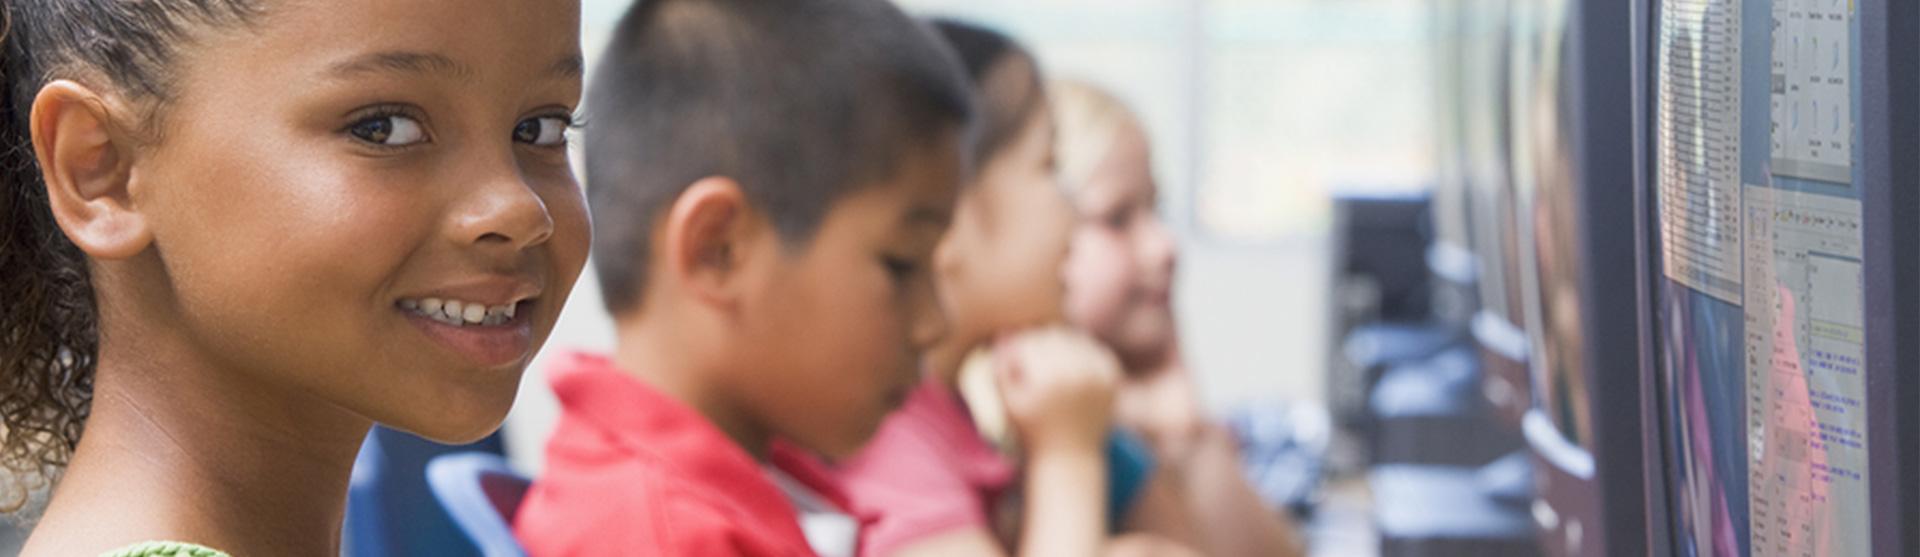 Year 4 primary school children working at computers